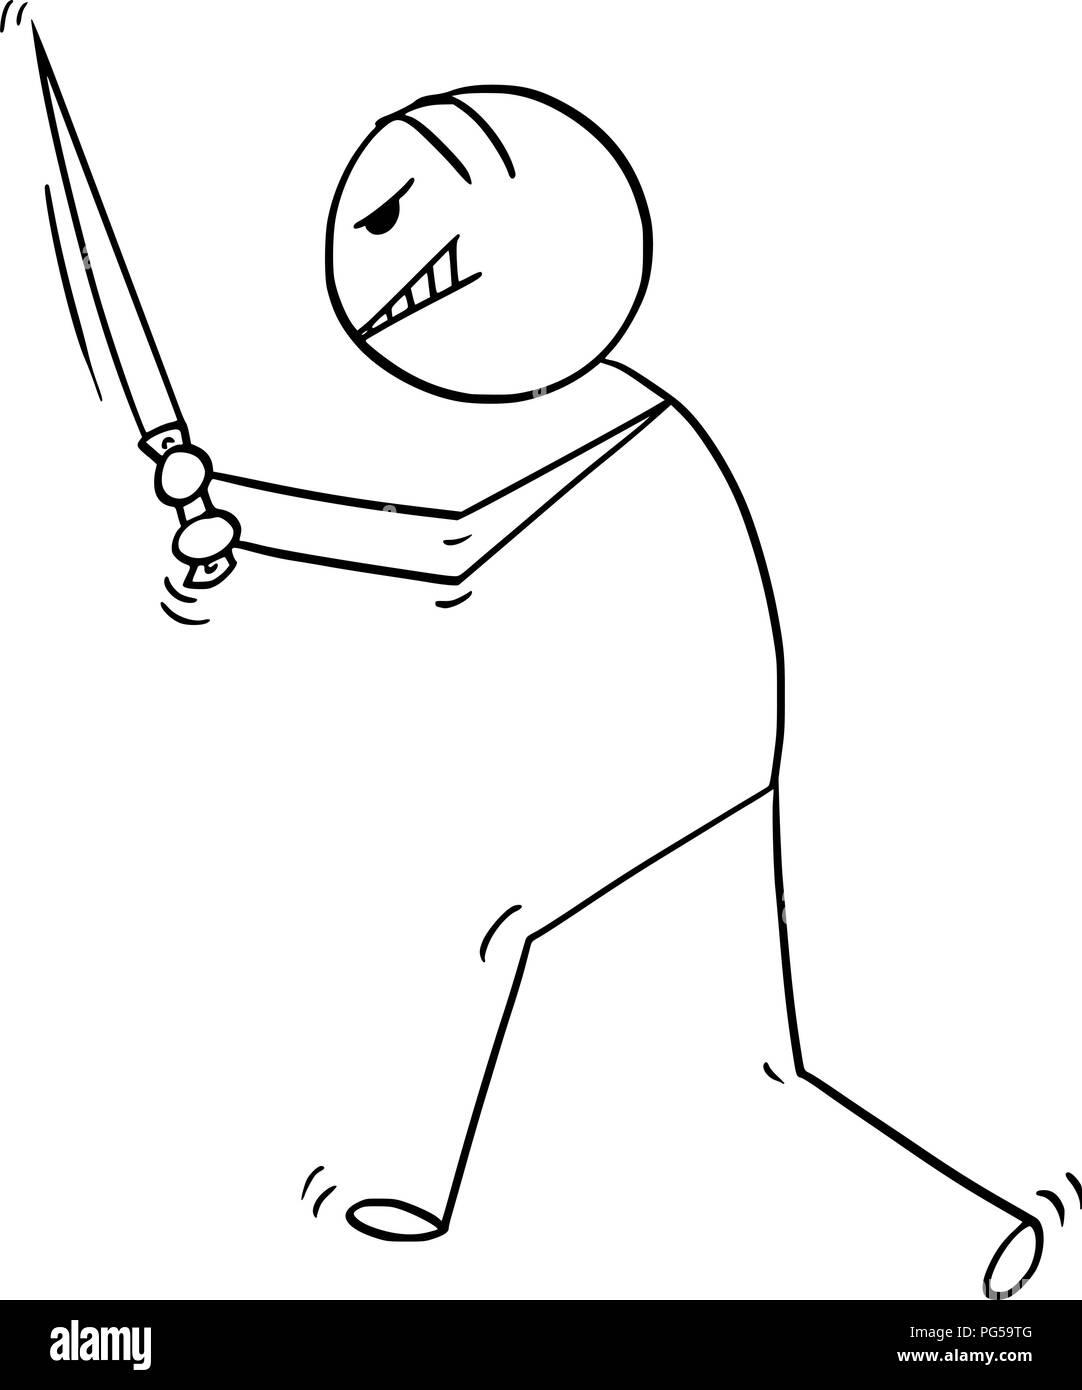 Cartoon of Insane Man or Maniac Killer Walking With Big Knife - Stock Image